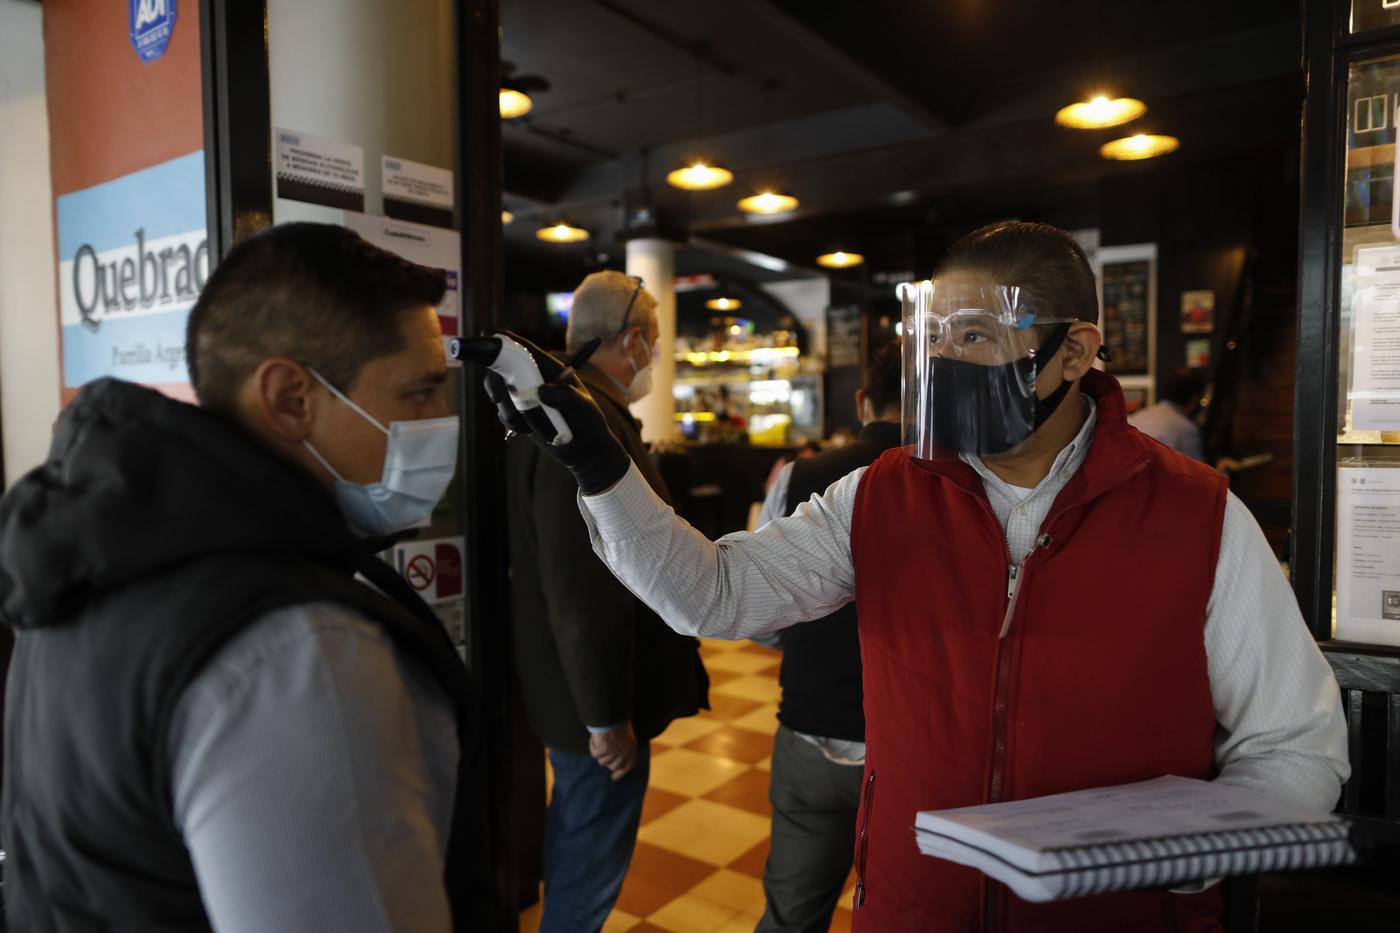 Coronavirus ristoranti apertura, Coldiretti